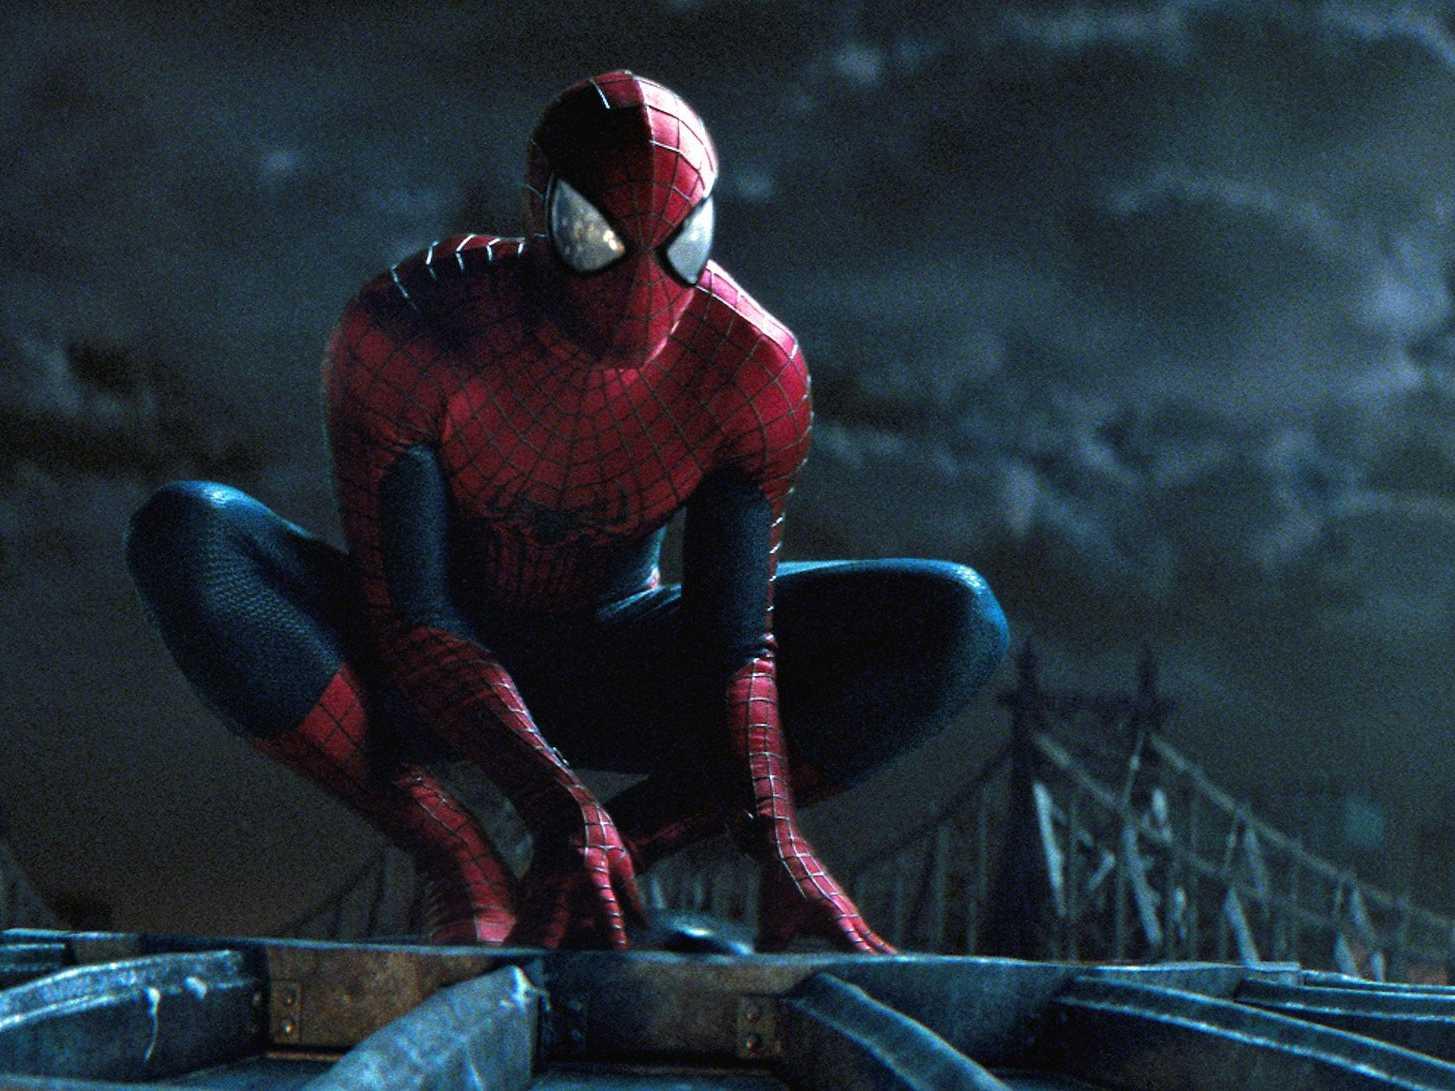 Spiderman Crouching On Building Wwwgalleryhipcom The